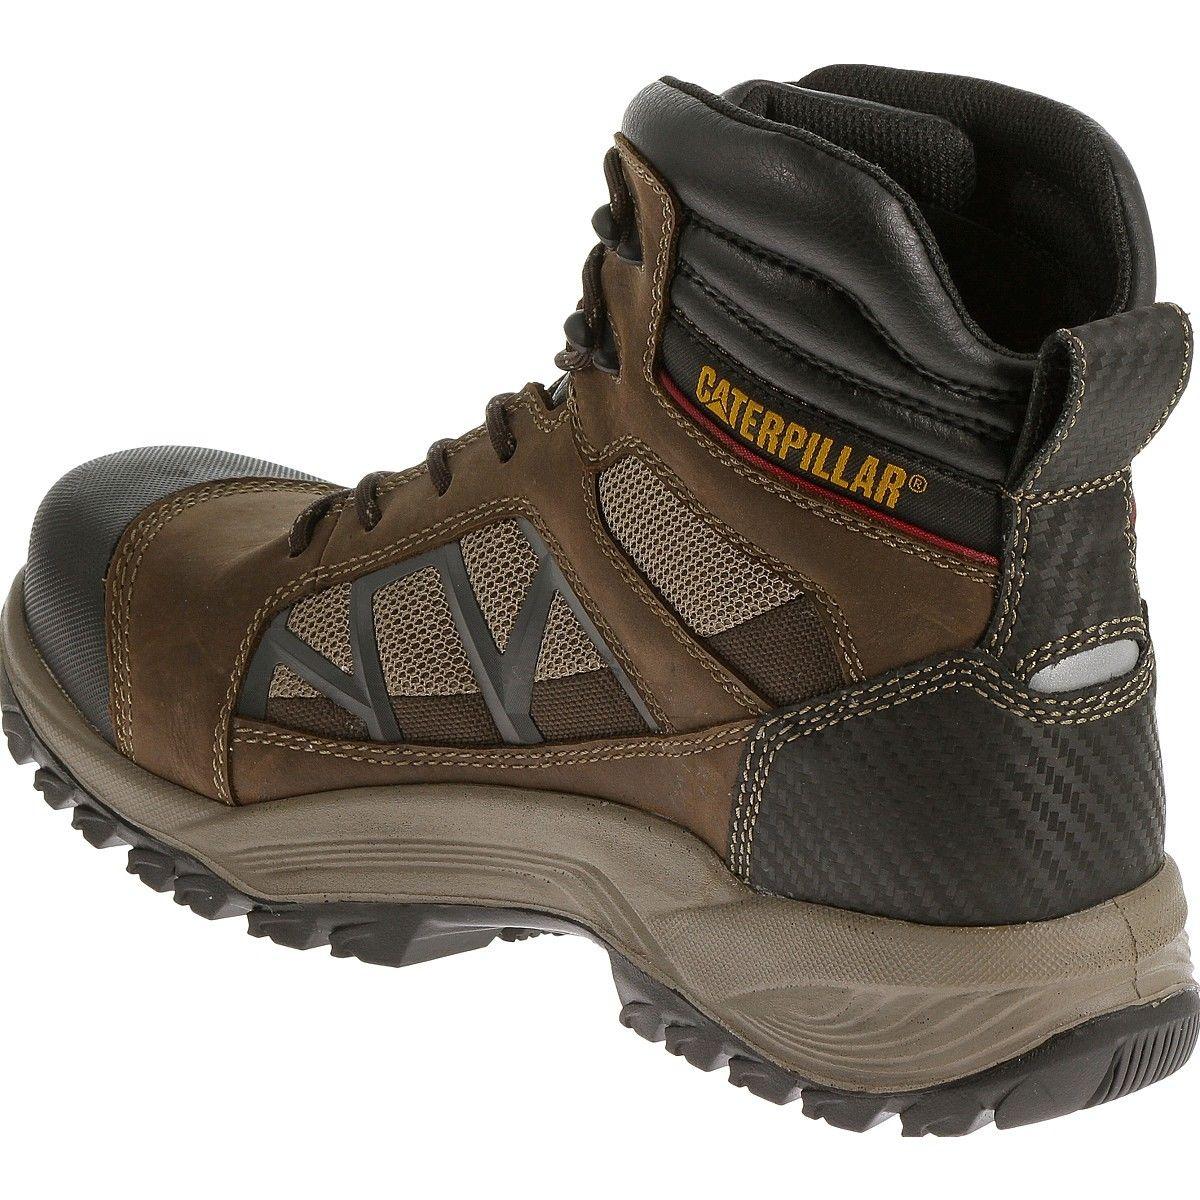 Jual Sepatu Safety Caterpillar Compressor CT WP Clay